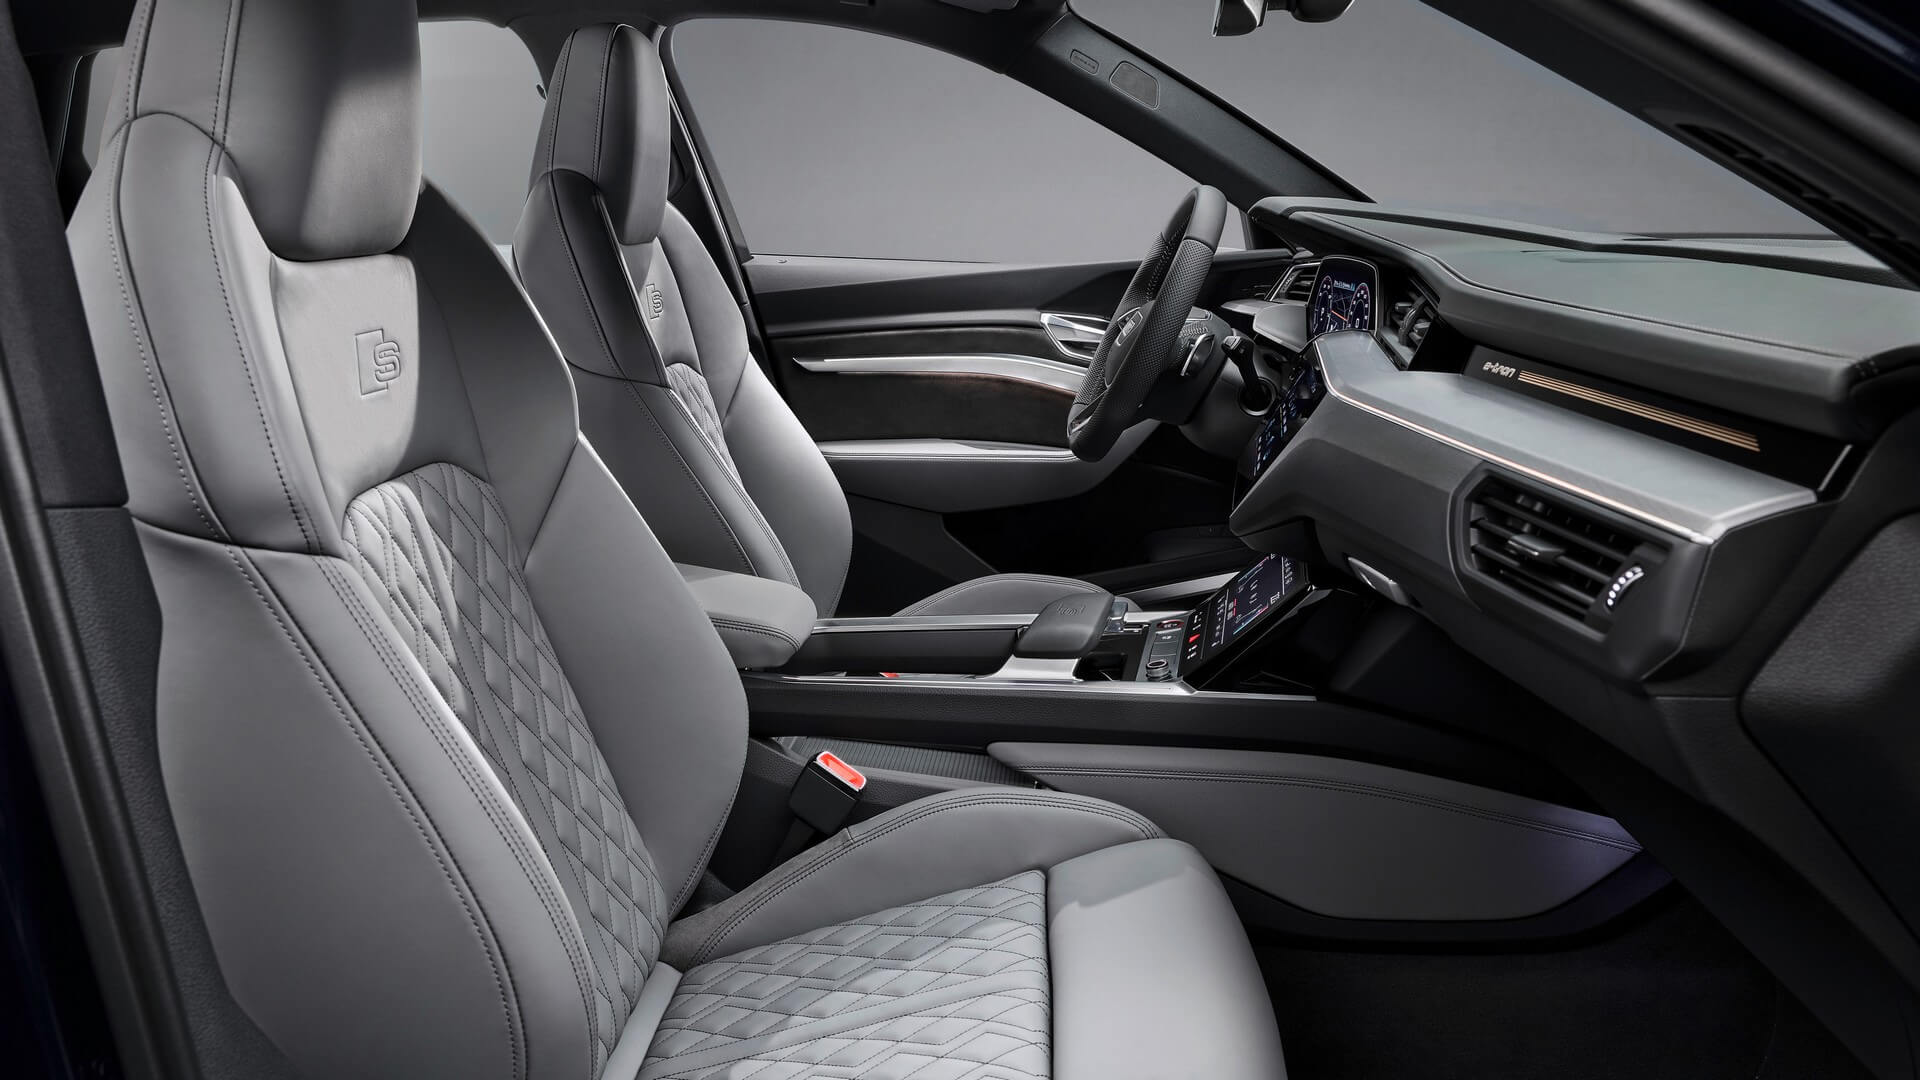 Audi-E-Tron-S-and-E-Tron-S-Sportback-2020-105